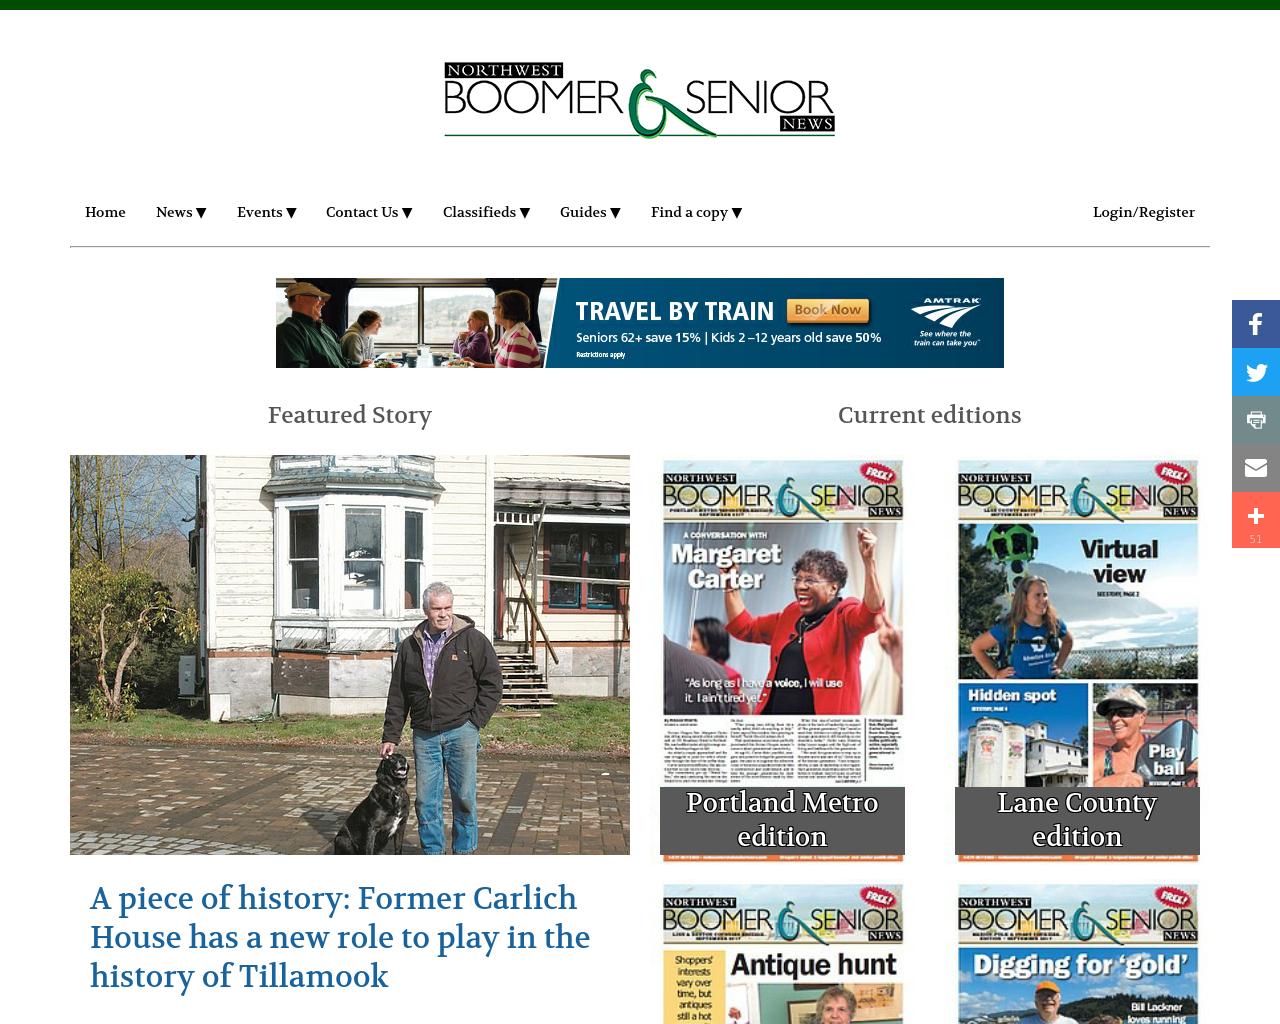 Northwest-Boomer-&-Senior-News-Advertising-Reviews-Pricing